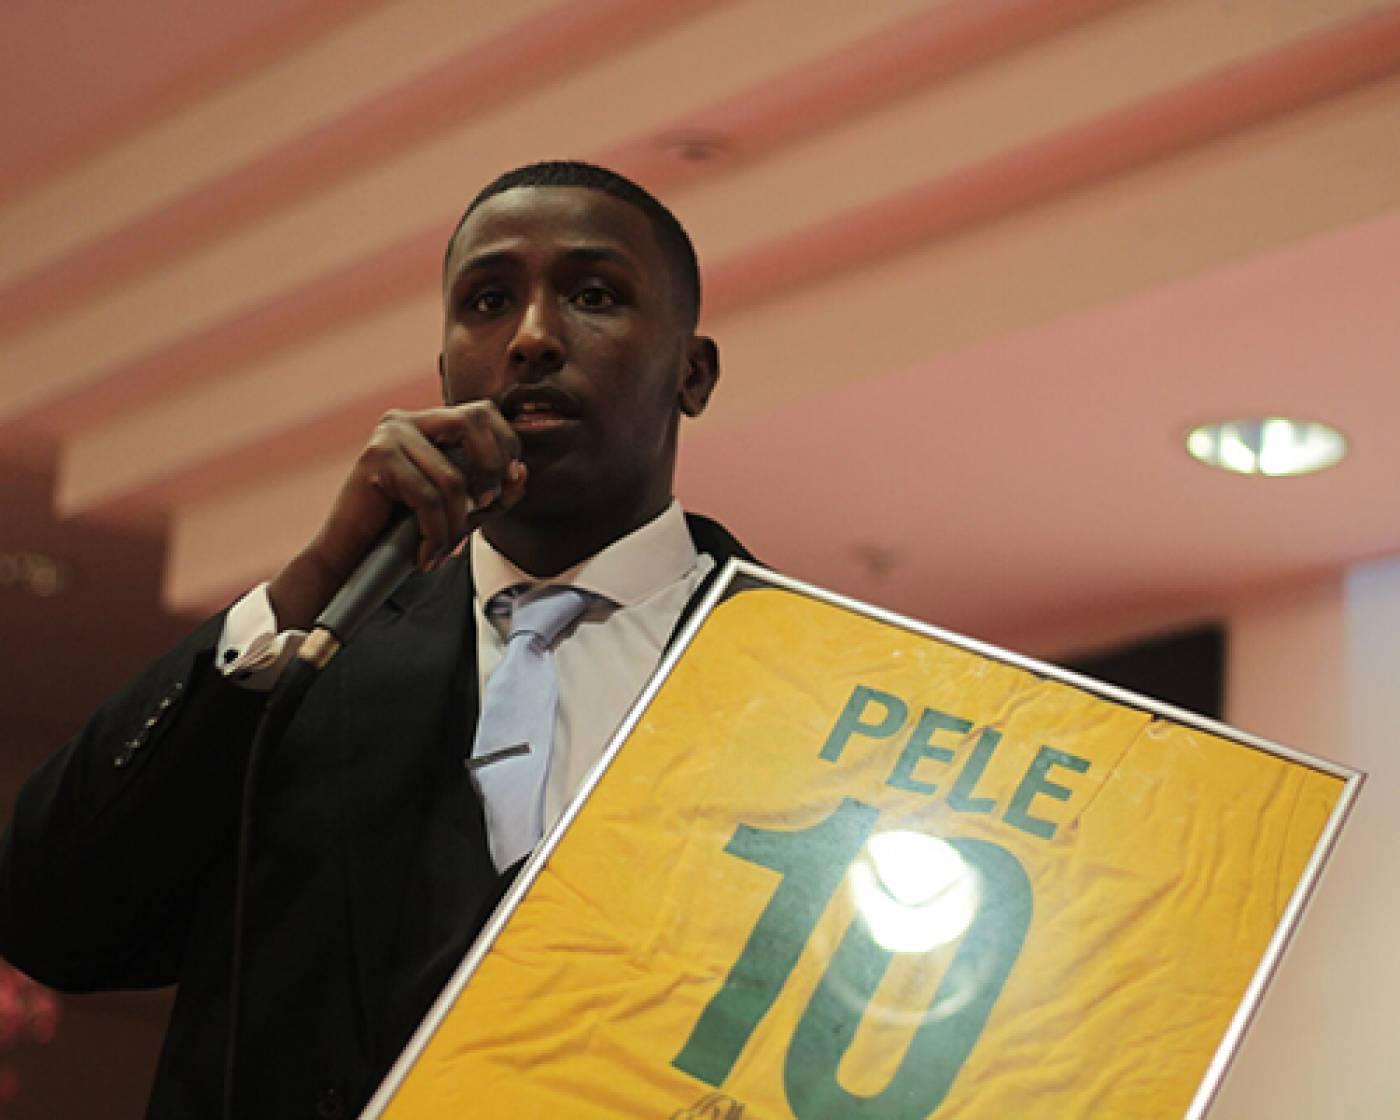 Abdul auctions a signed Pele shirt